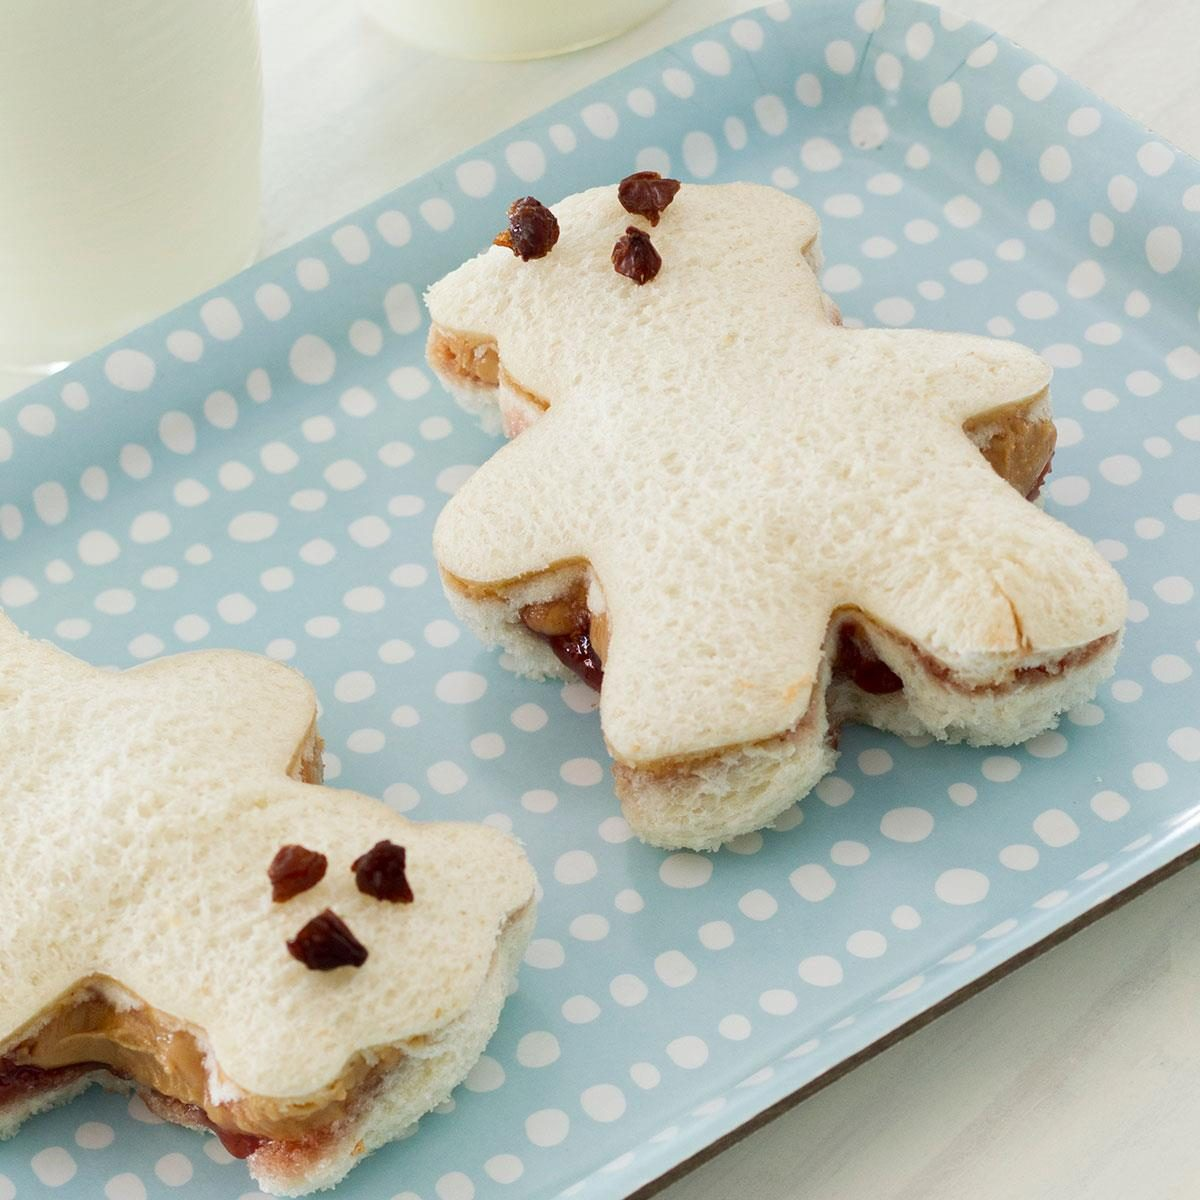 Peanut Butter And Banana Teddy Bear Sandwiches Recipe Taste Of Home